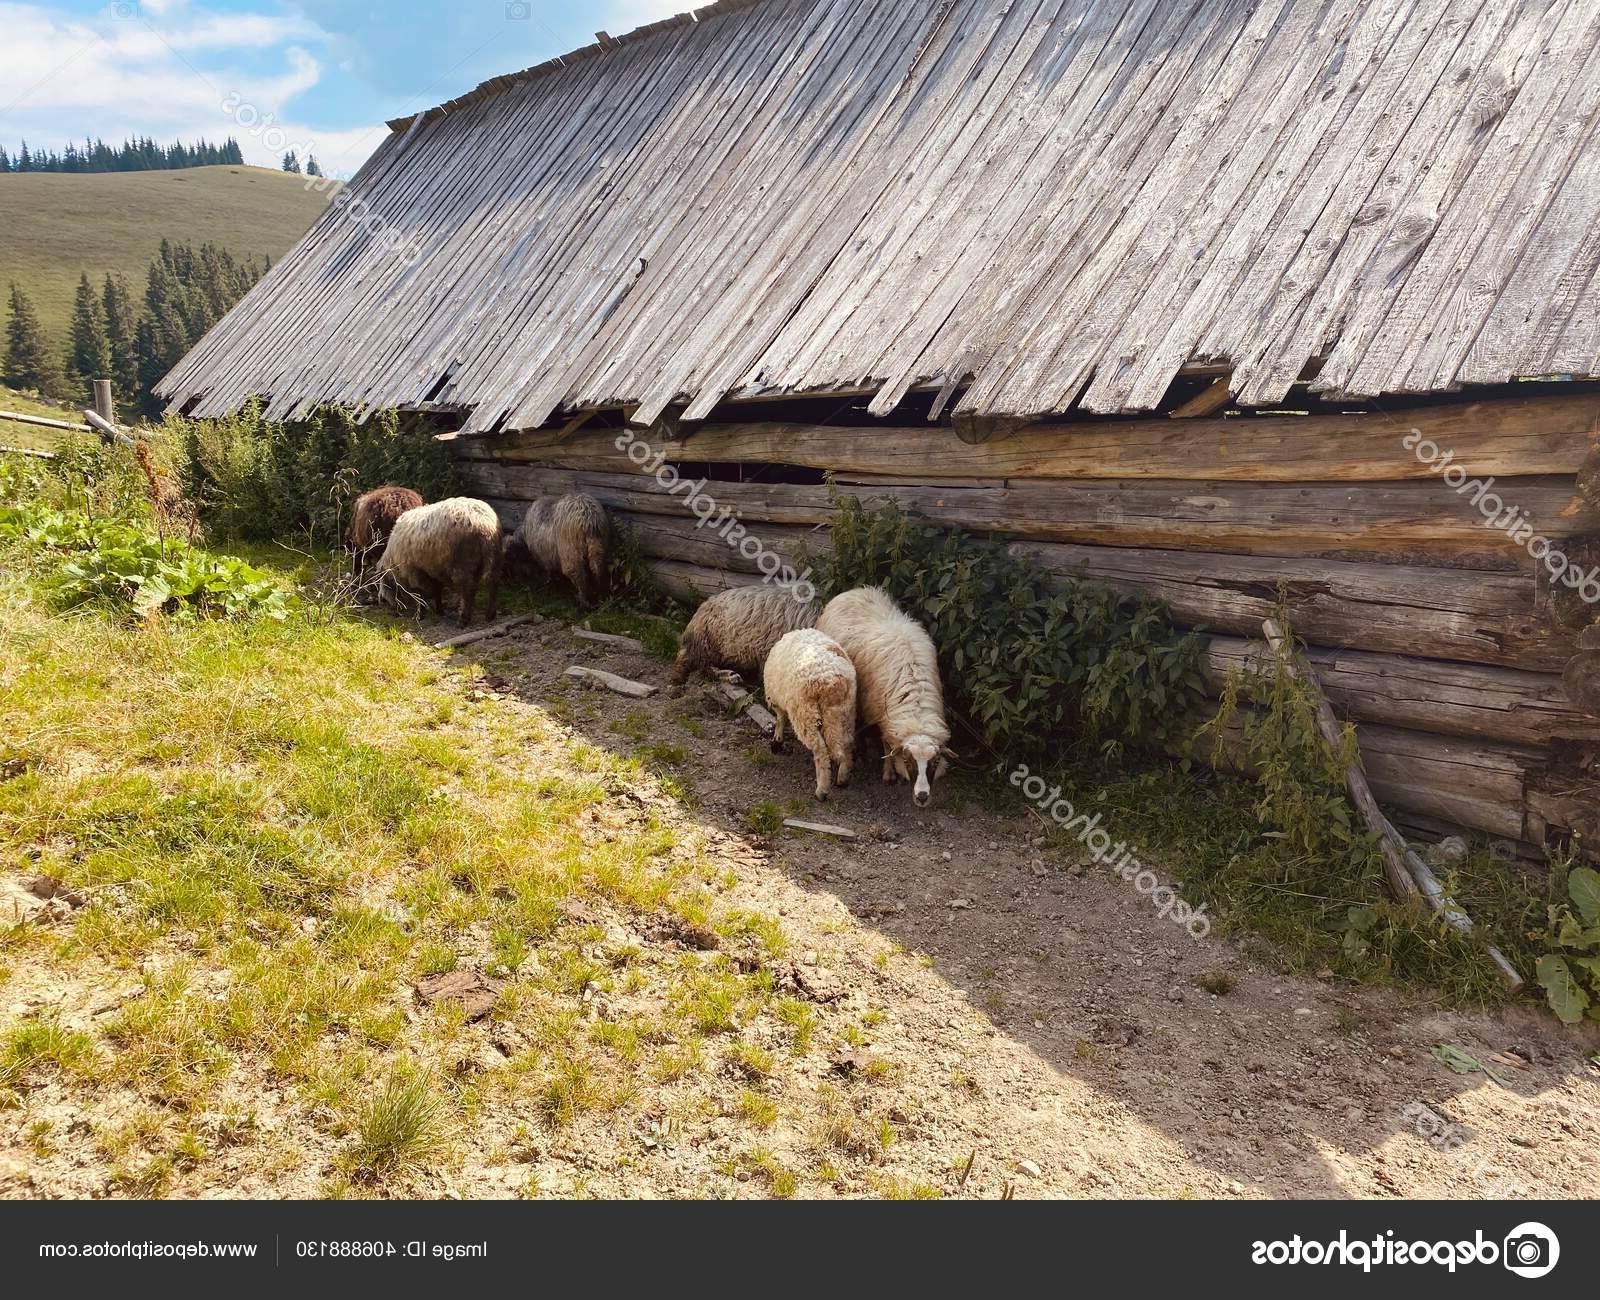 Domba Sebuah Peternakan Makan Rumput Luar Pada Alam — Stok with Gambar Domba Makan Rumput